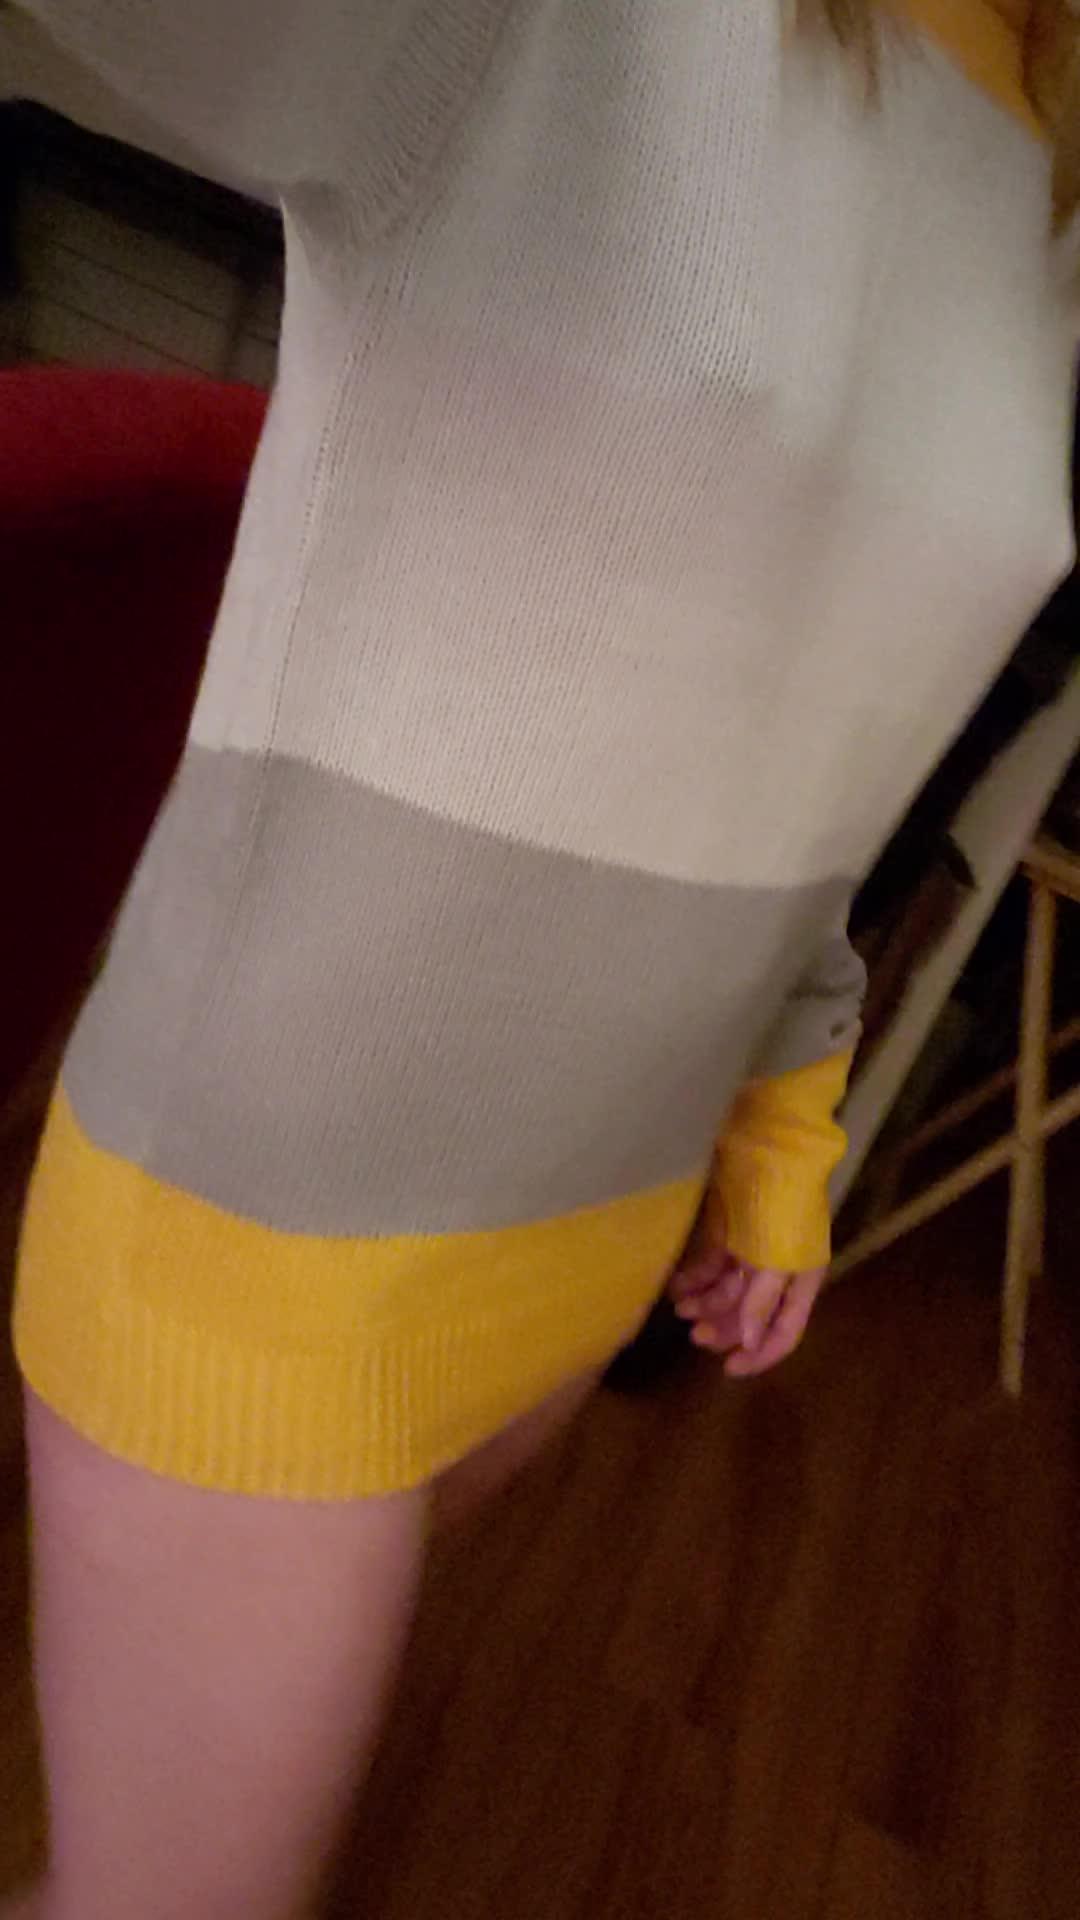 I like big sweaters cuz they make me feel extra small 🤗